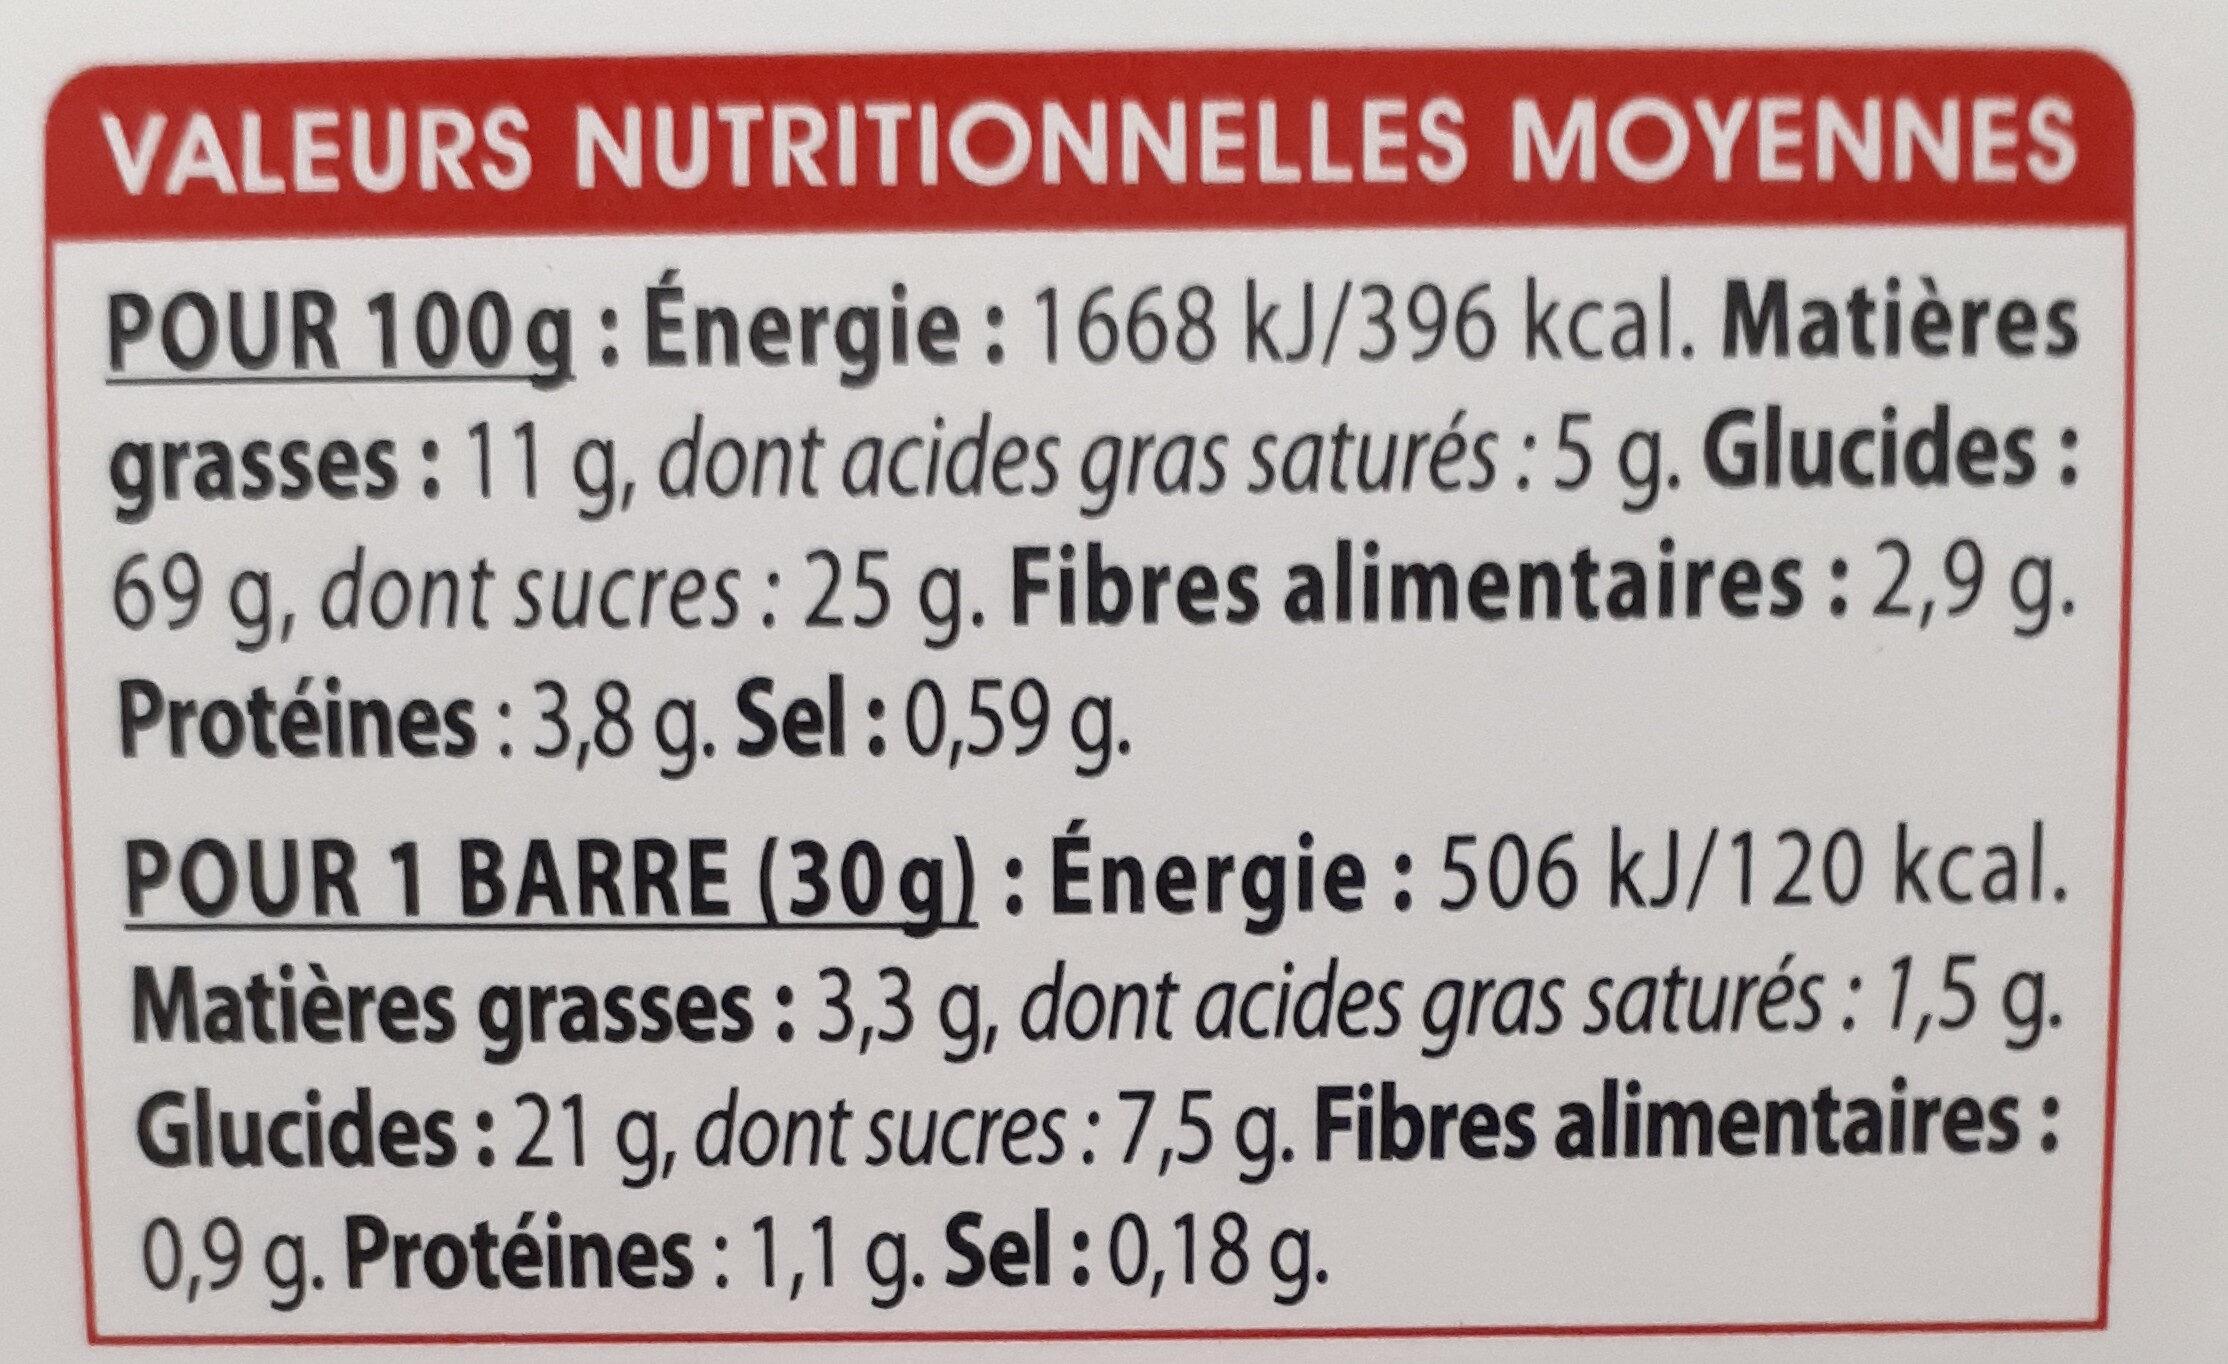 Barres pêche abricot - Voedingswaarden